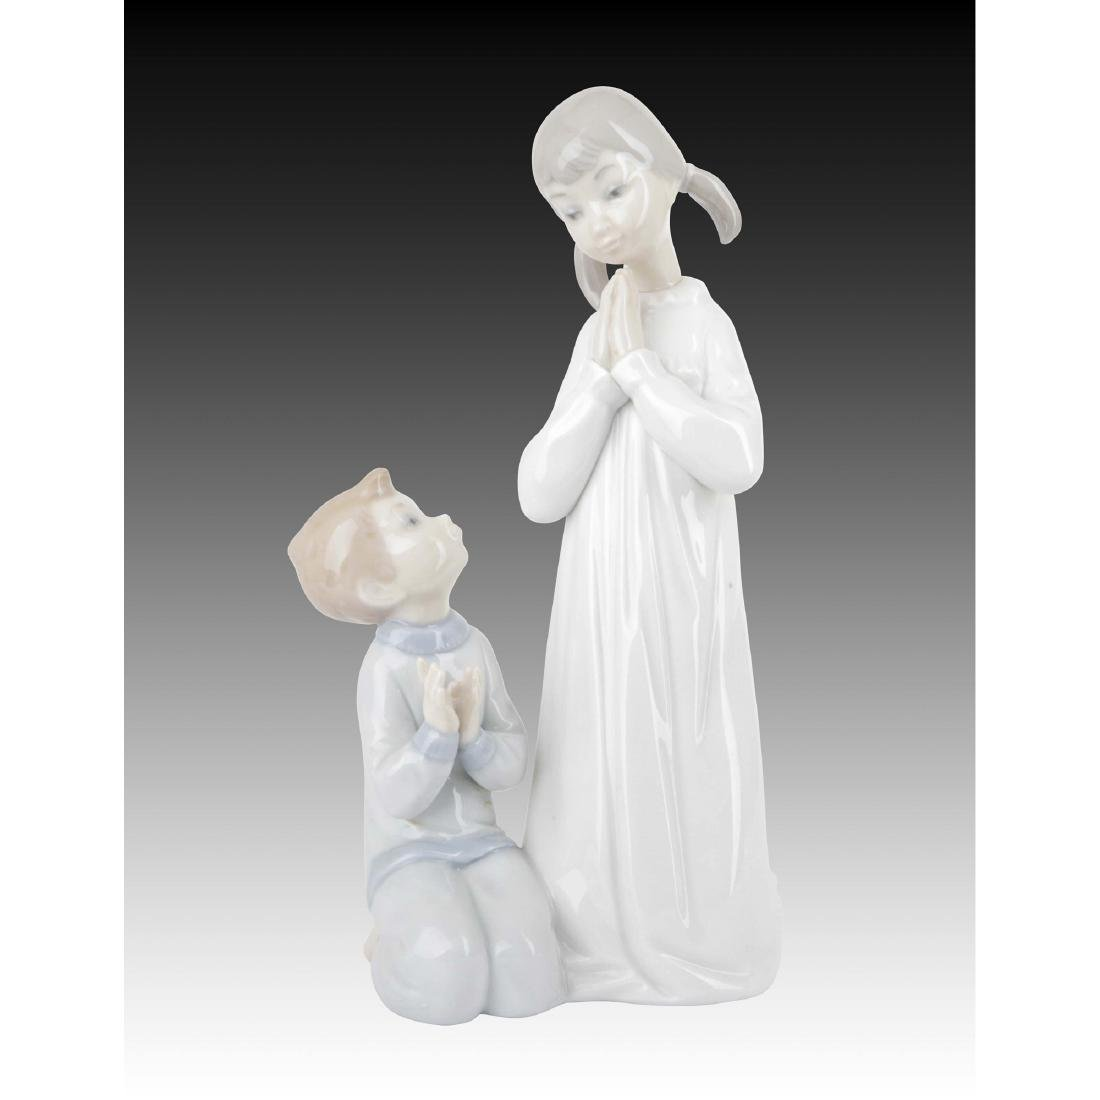 LLADRO TEACHING TO PRAY FIGURINE 4779 RETIRED 1997